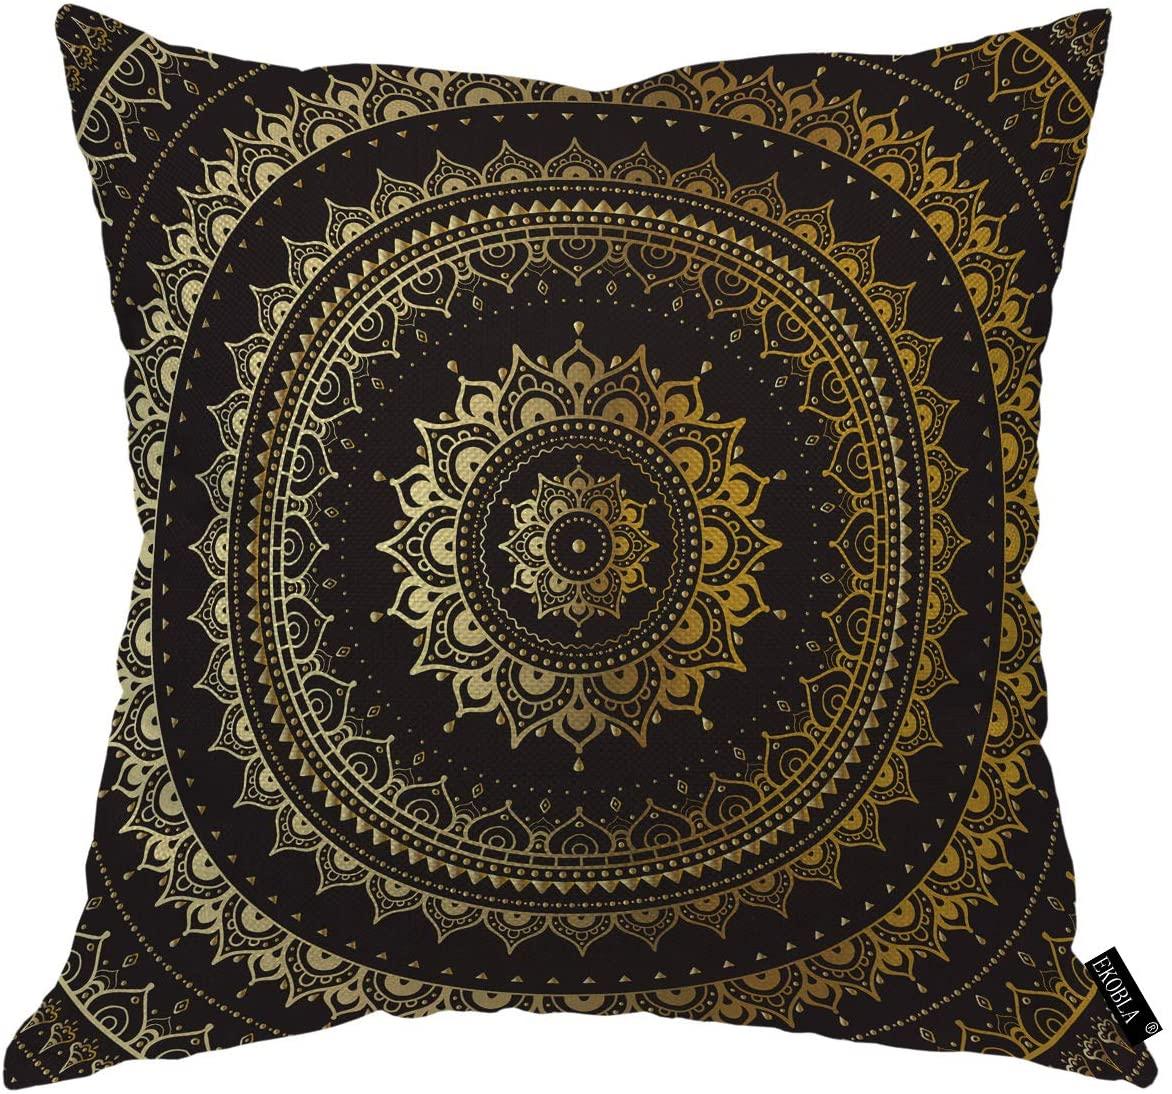 EKOBLA Vintage Background Throw Pillow Covers Golden Copper Sliver Diamond Leaves Ethnic Geometry Circle Decorative Square Cushion Case for Men Women Boys Girls Home Decor Cotton Linen 16x16 Inch